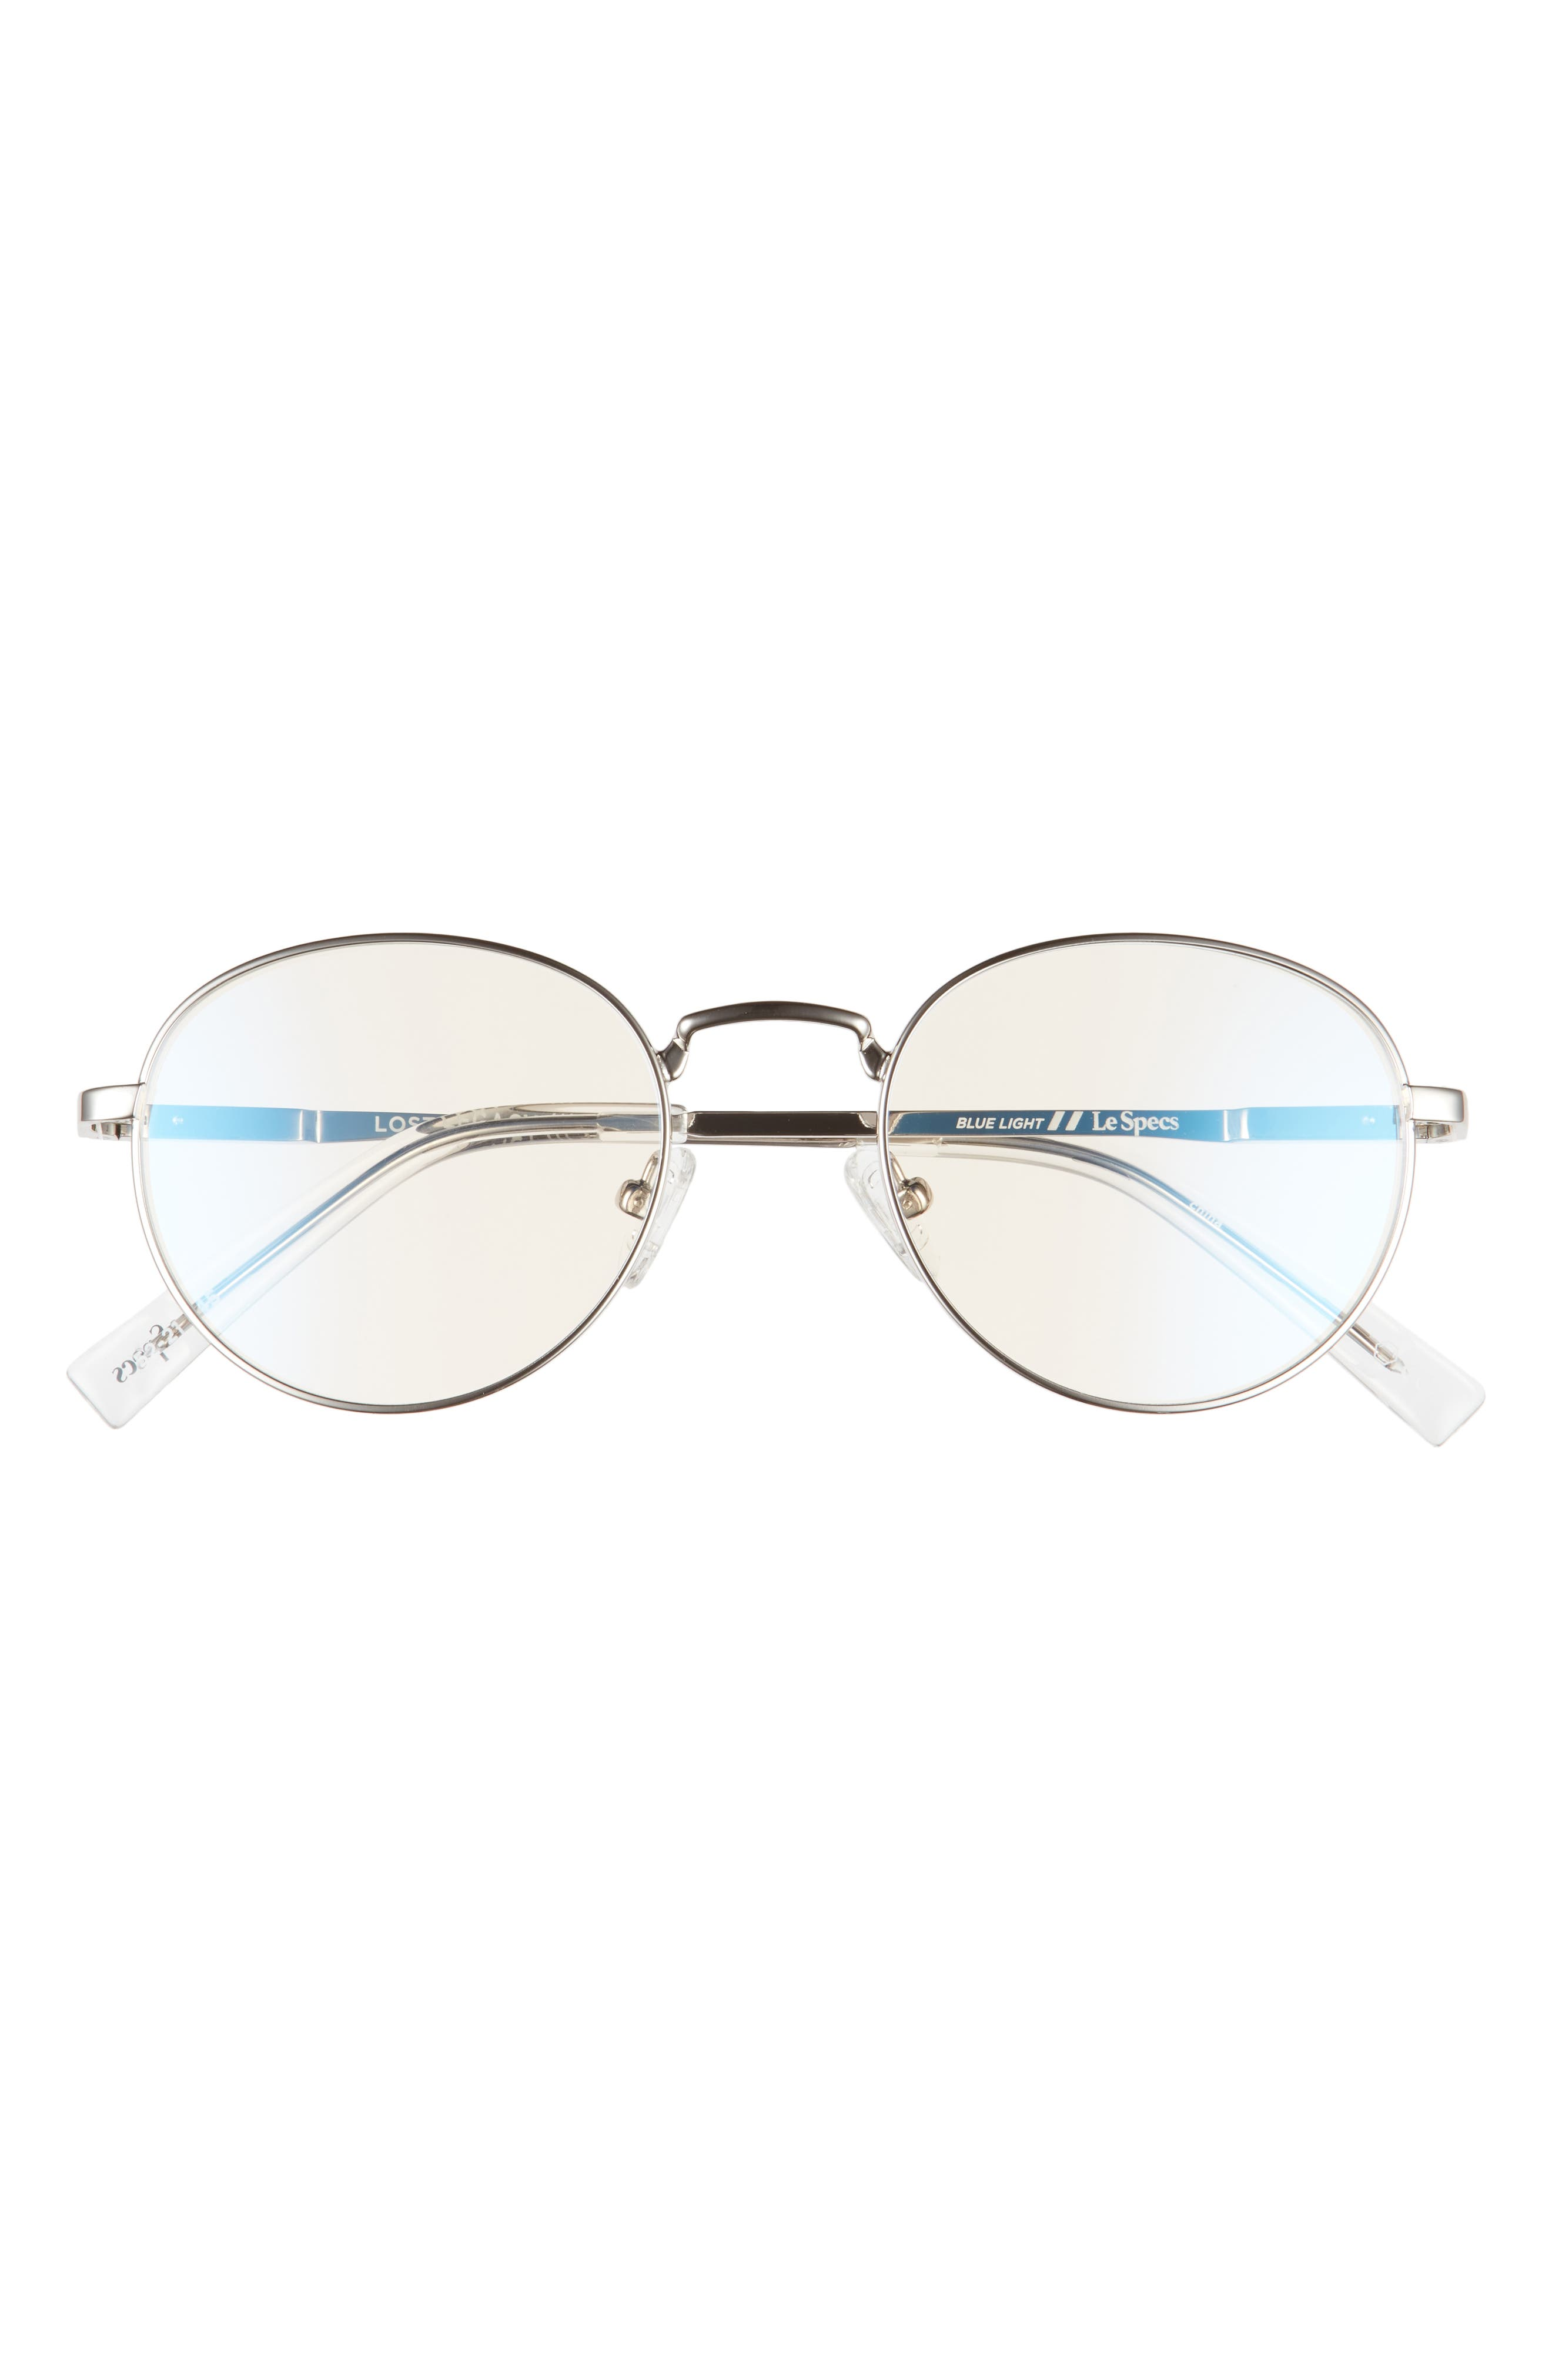 Legacy 49mm Small Blue Light Blocking Glasses